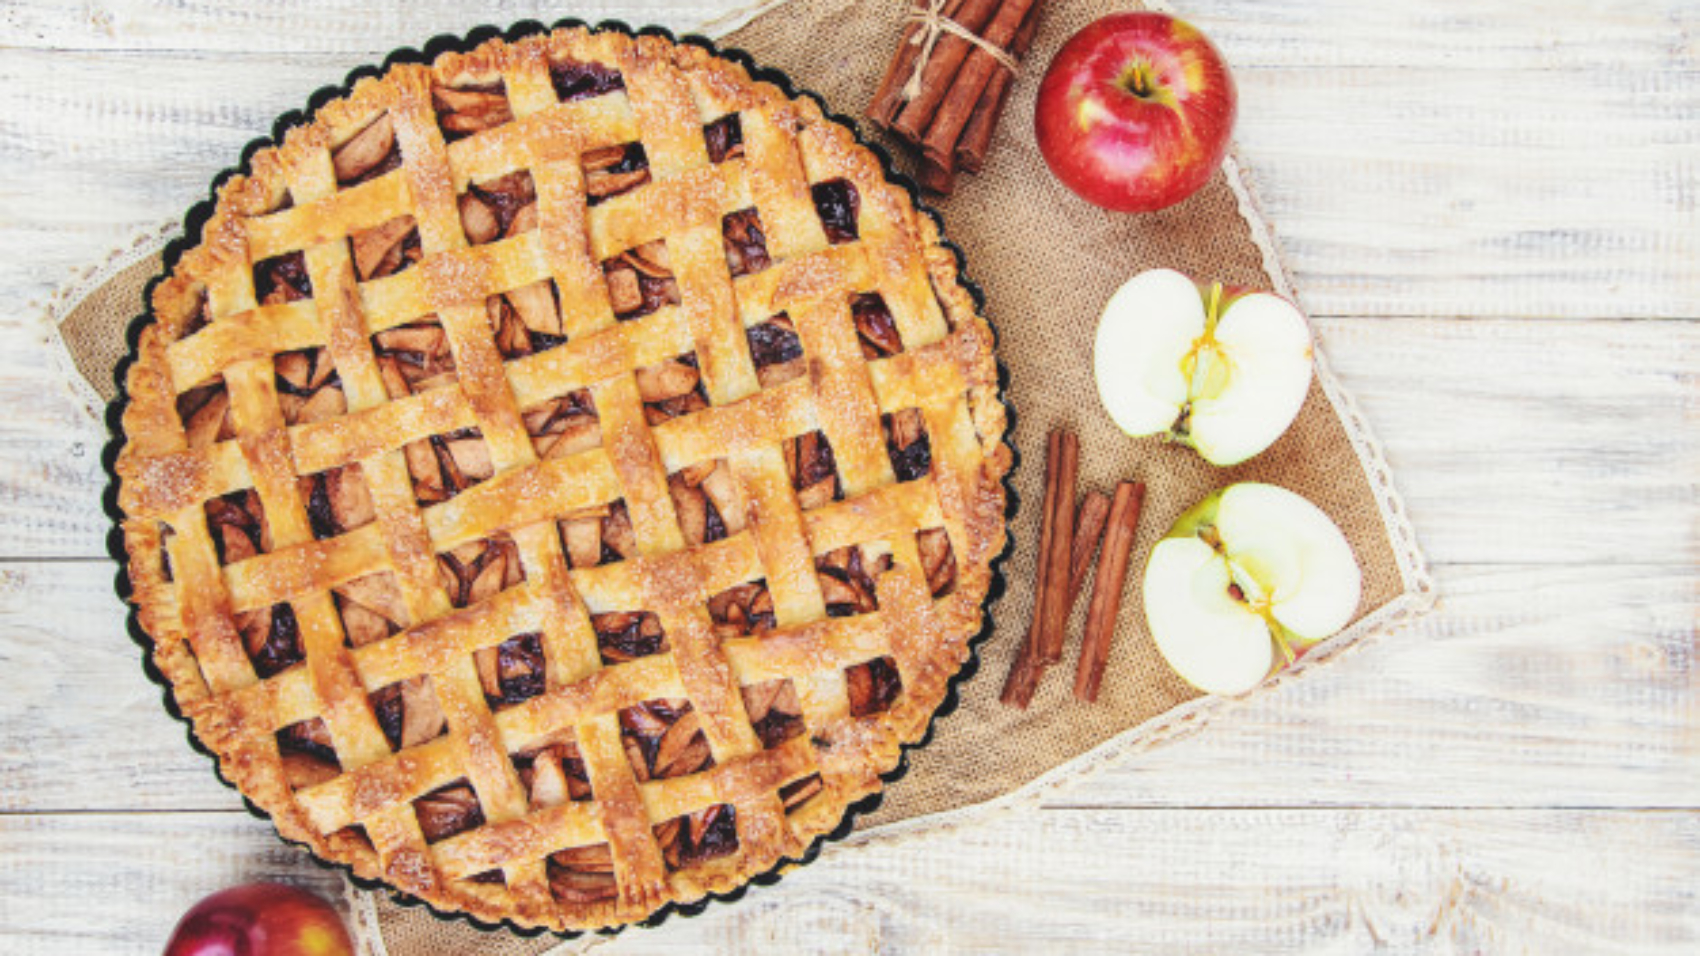 pie-with-apples-cinnamon_73944-9235